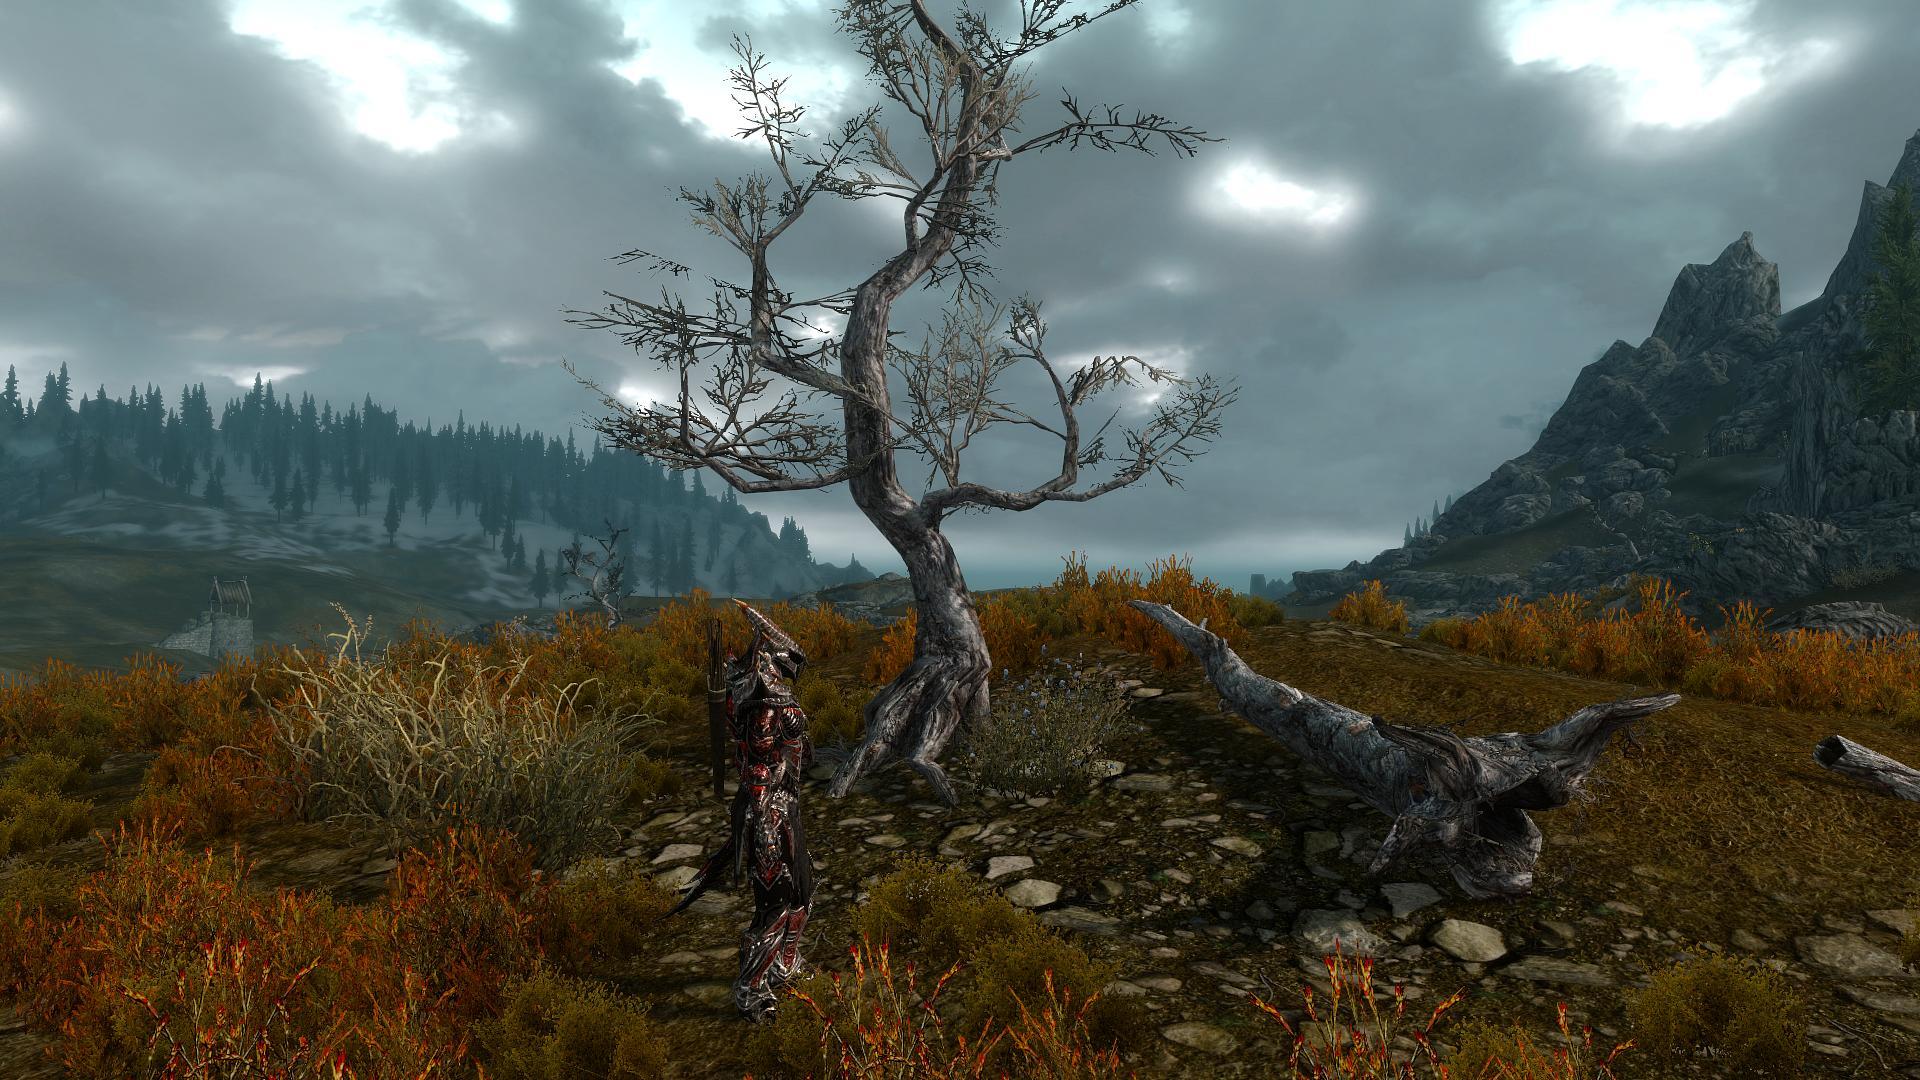 000186.Jpg - Elder Scrolls 5: Skyrim, the